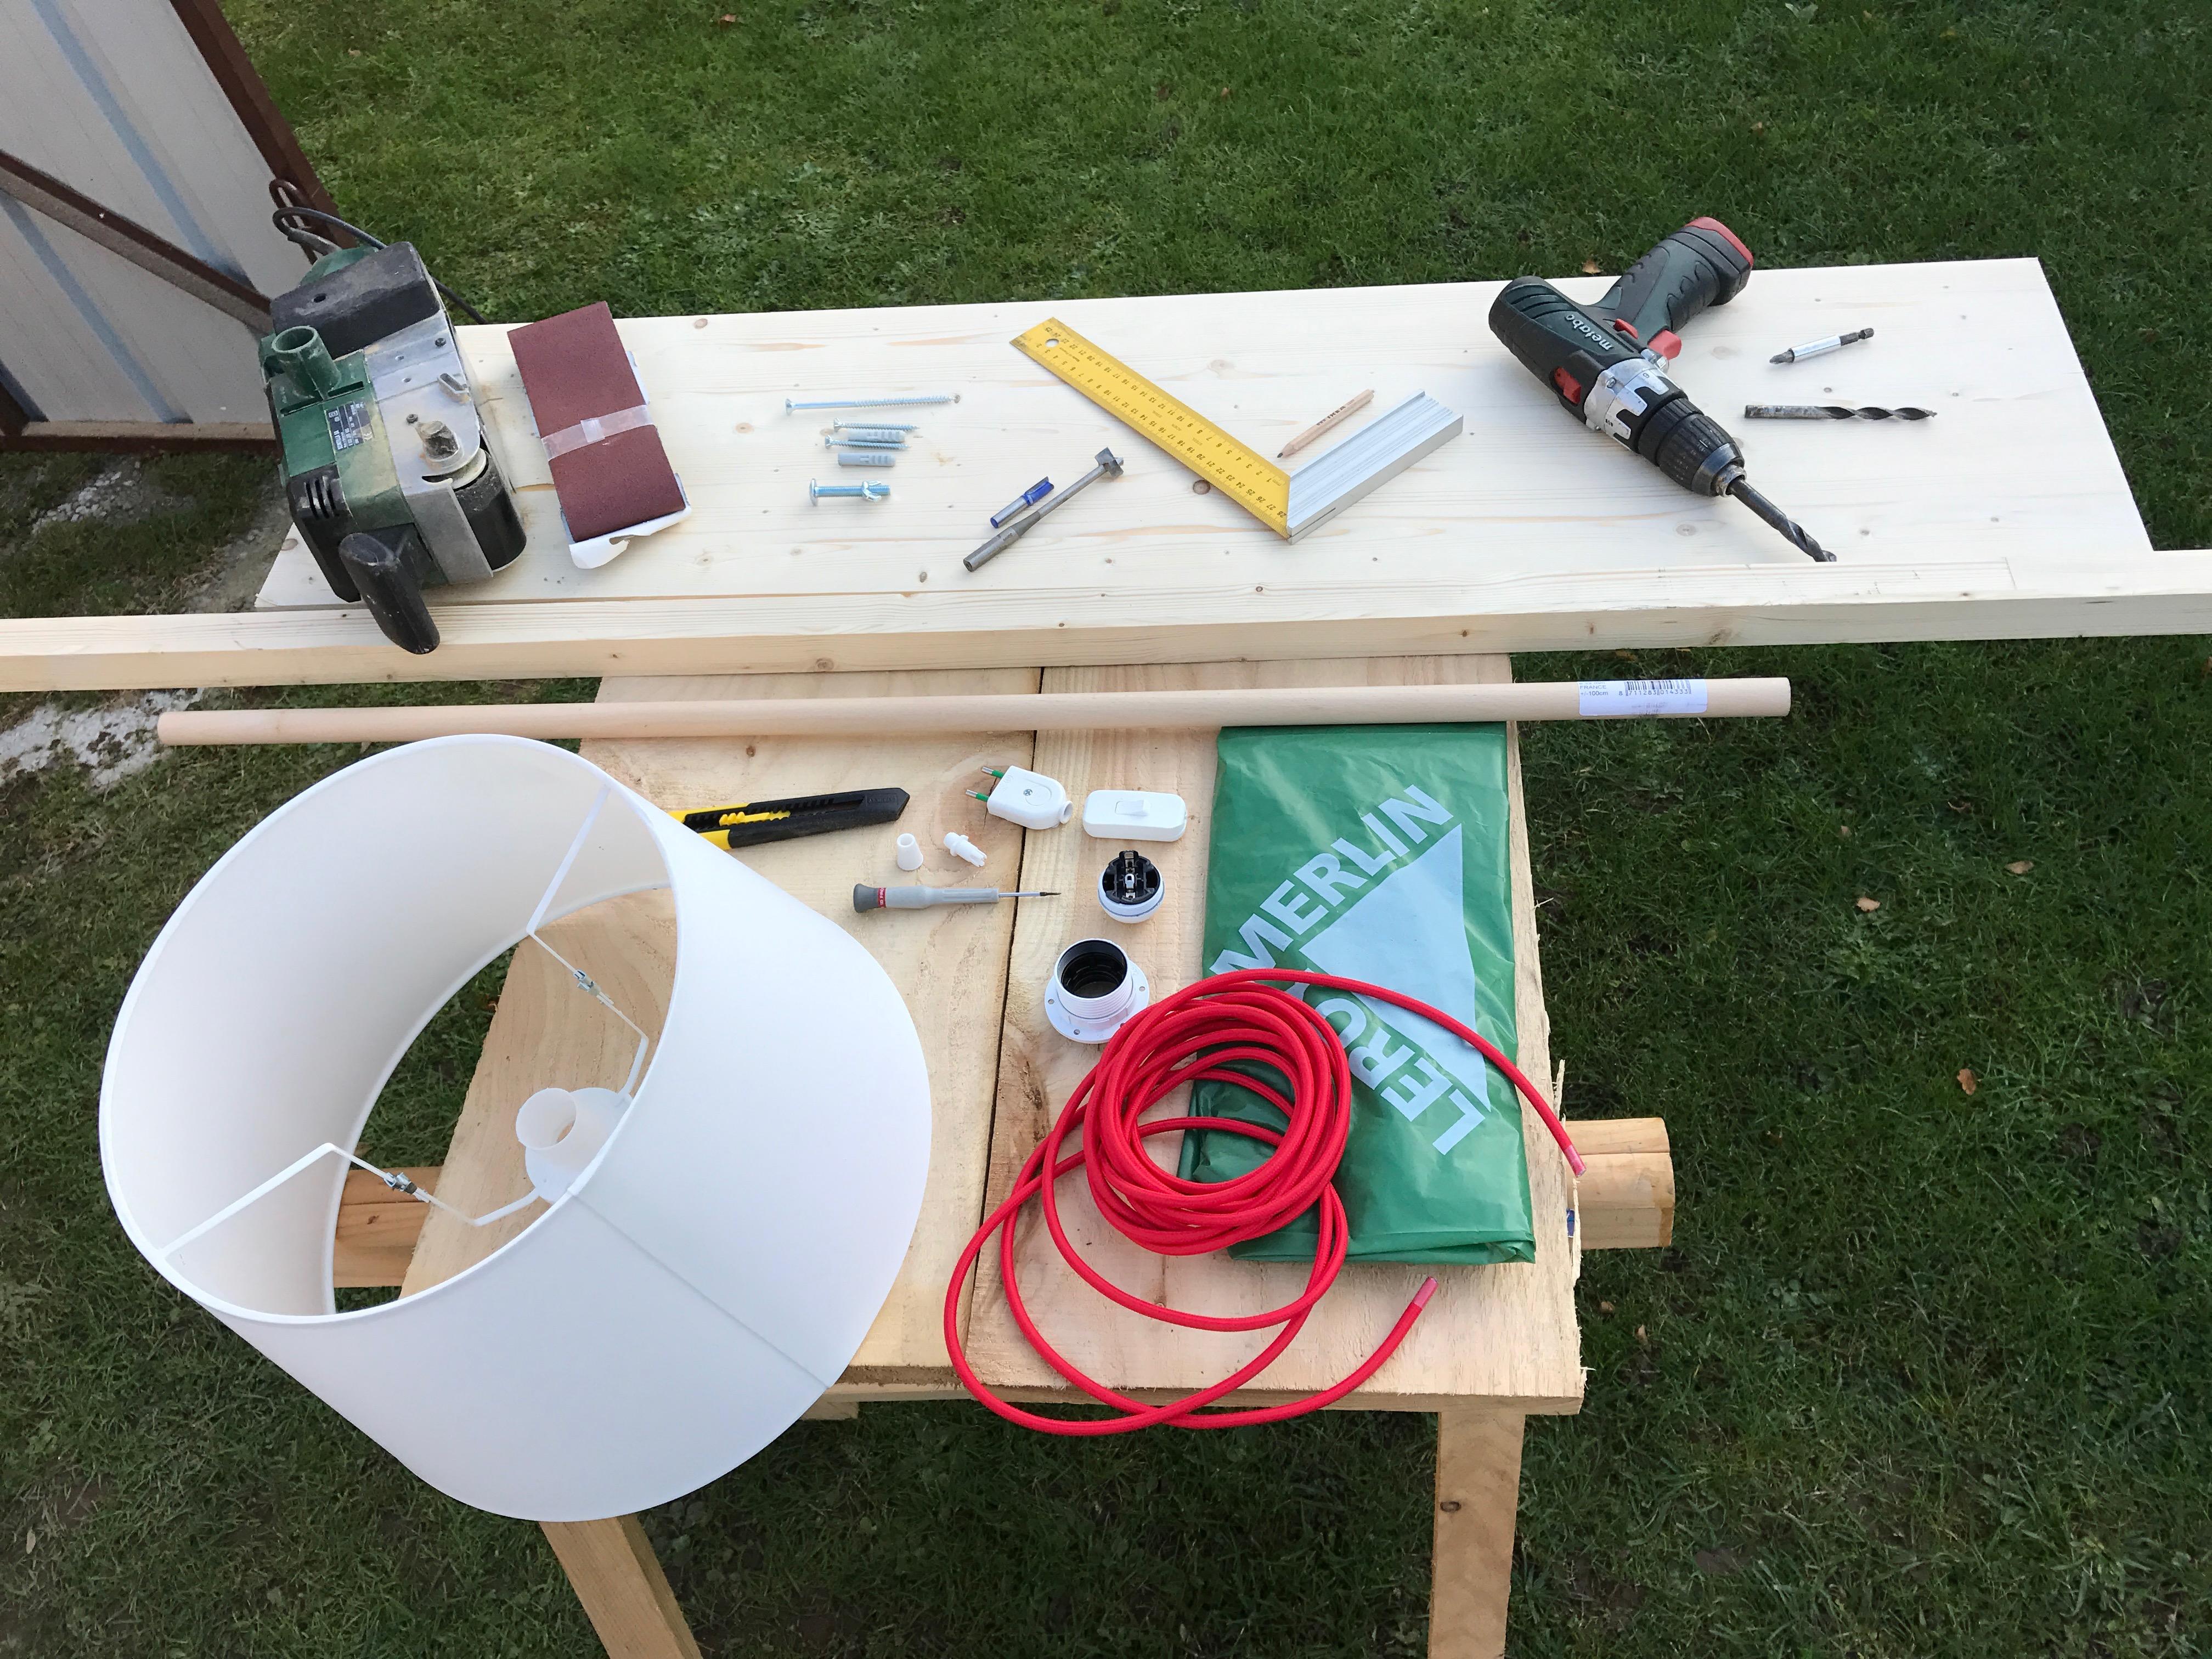 Lampe articul e en bois avec tablette et pat re IMG 4624.jpg